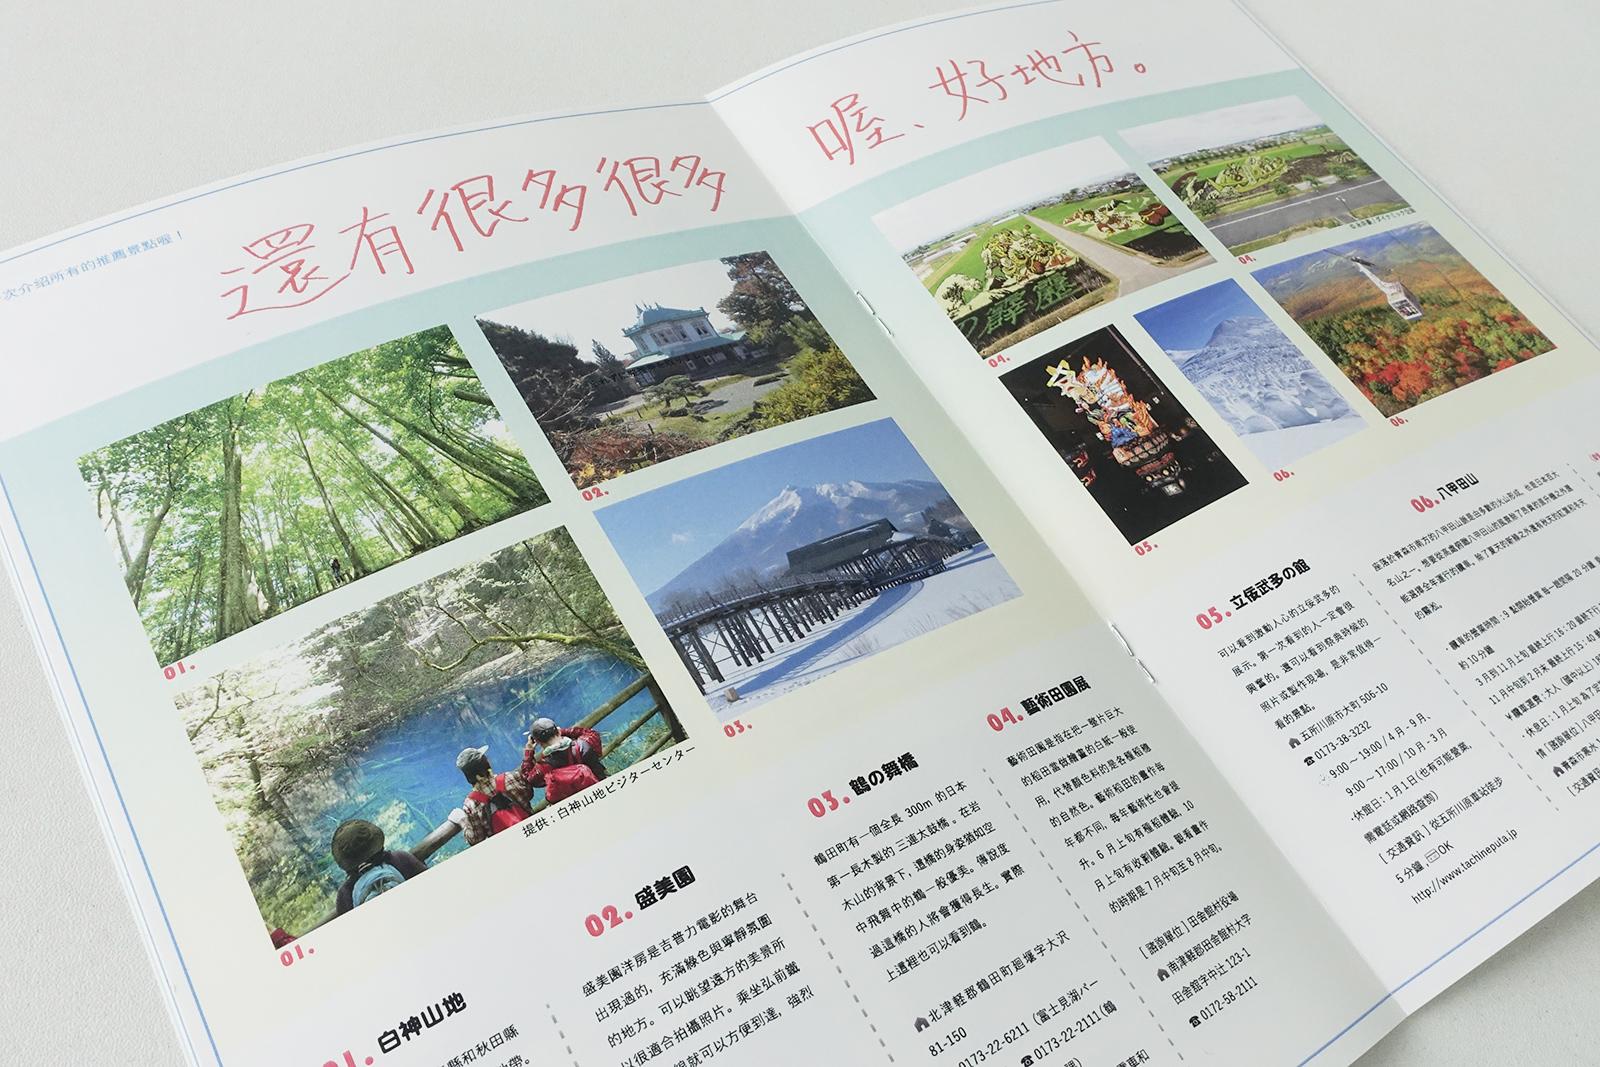 Hirogress制作の青森県観光ガイドブック『青森案内』中身